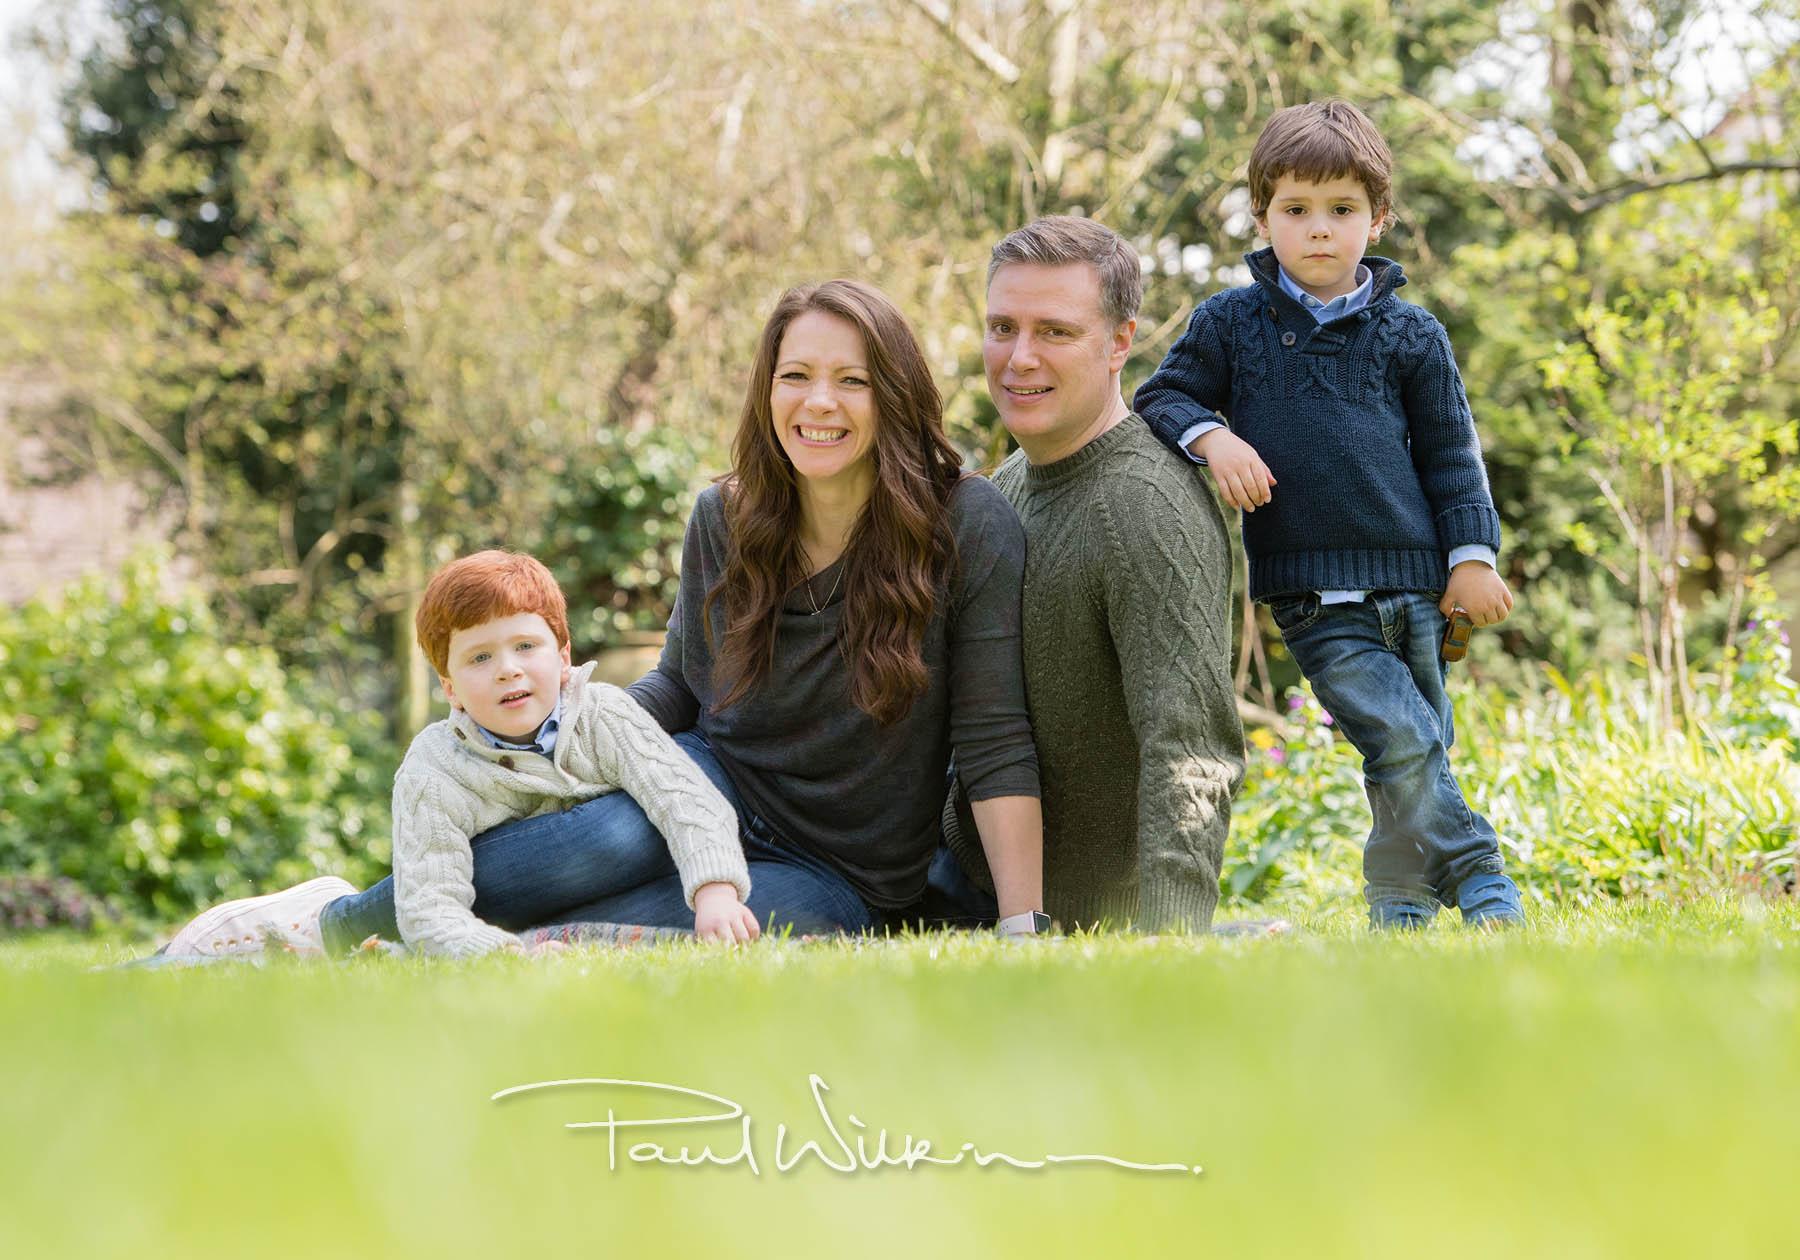 Family Photoshoot Clothing Ideas